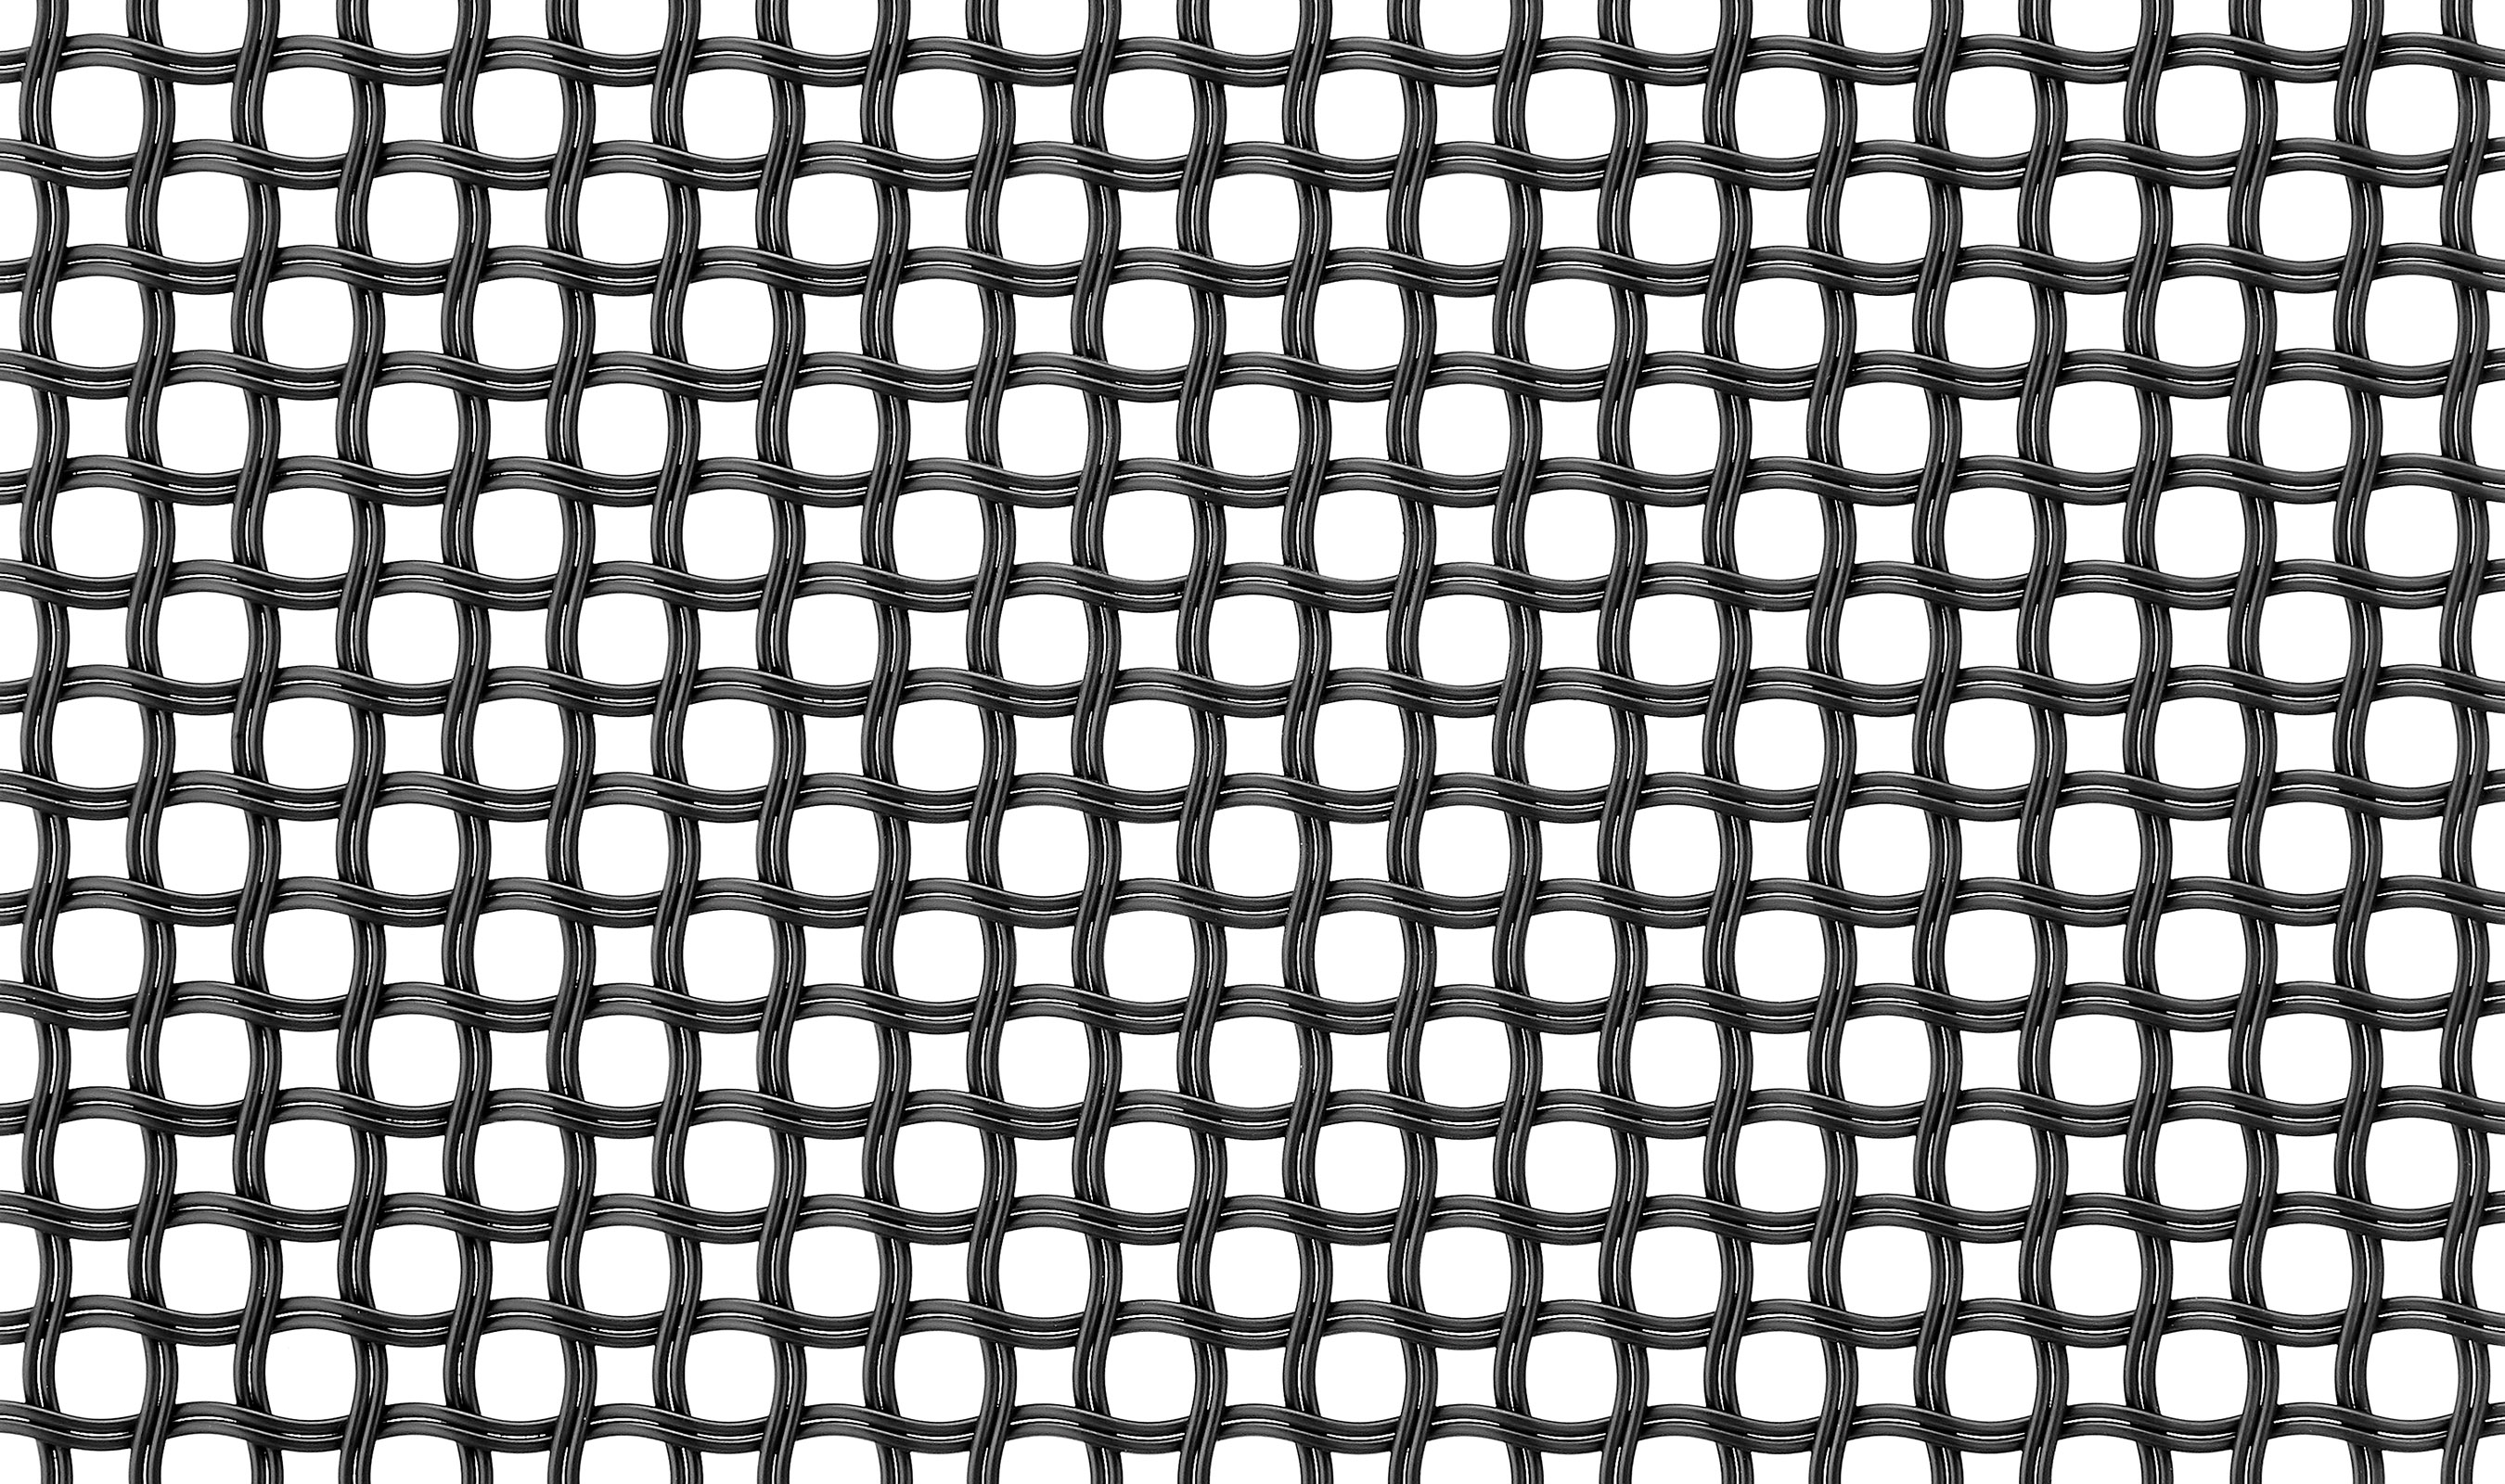 M22-83 Decorative mesh in Dark Oxide Plated finish